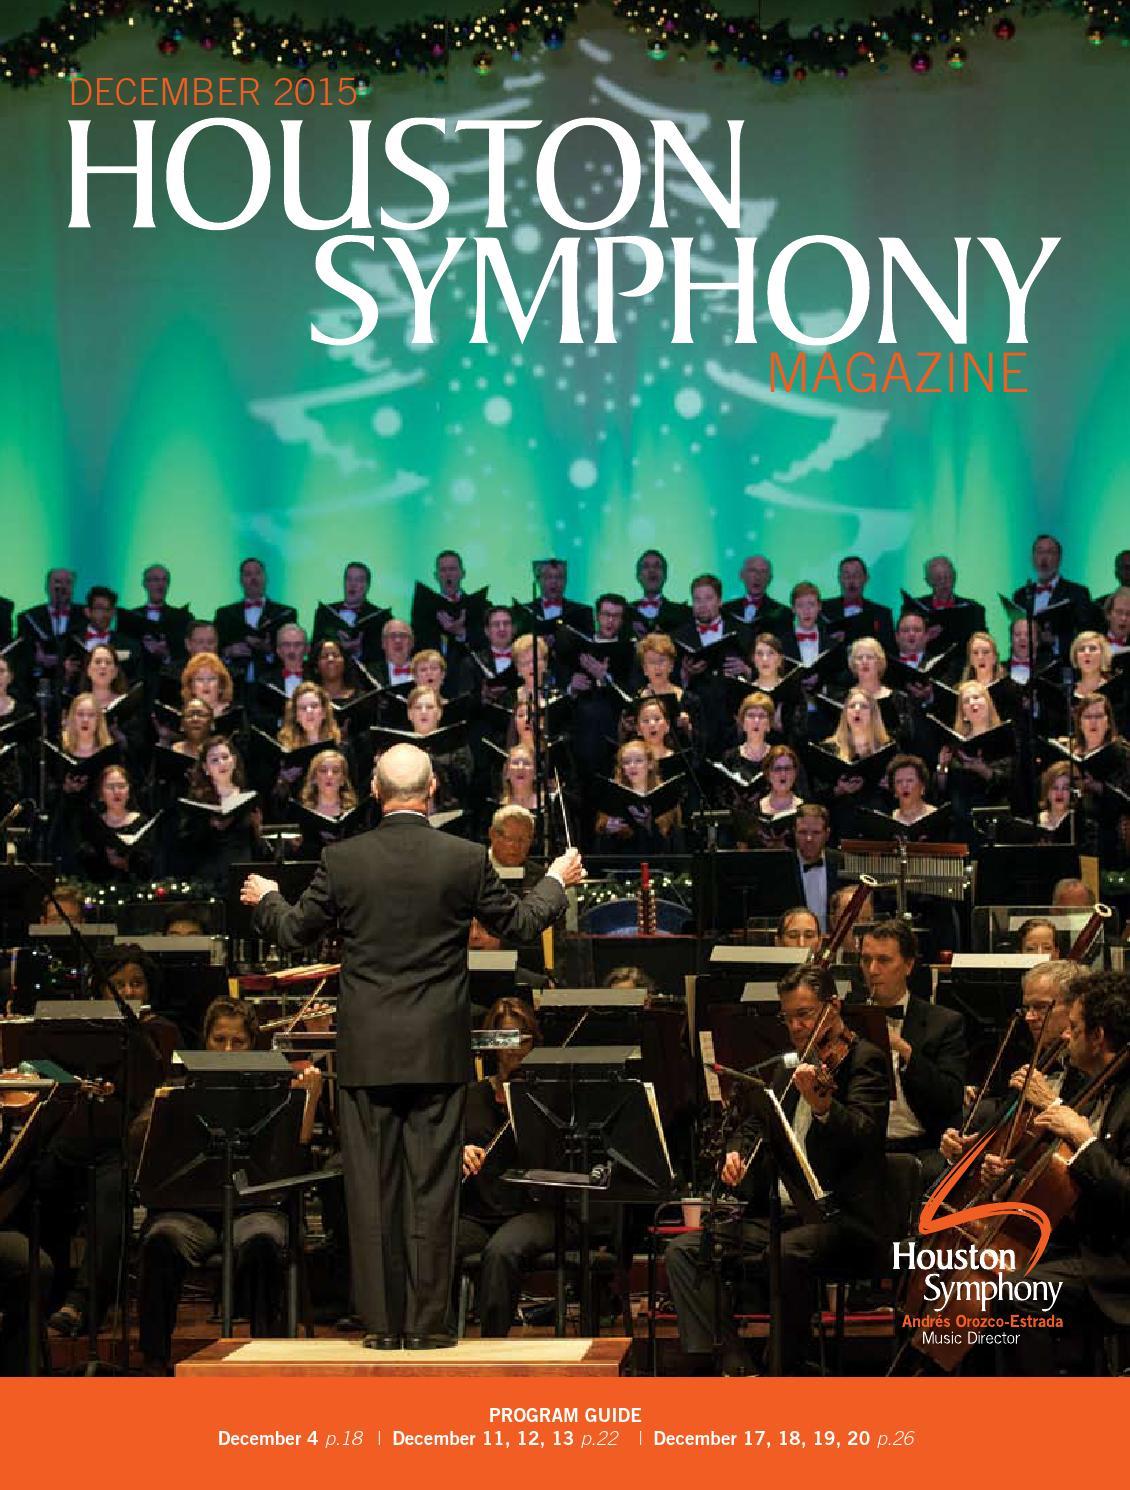 Houston Symphony Magazine — December 2015 by Houston Symphony - issuu